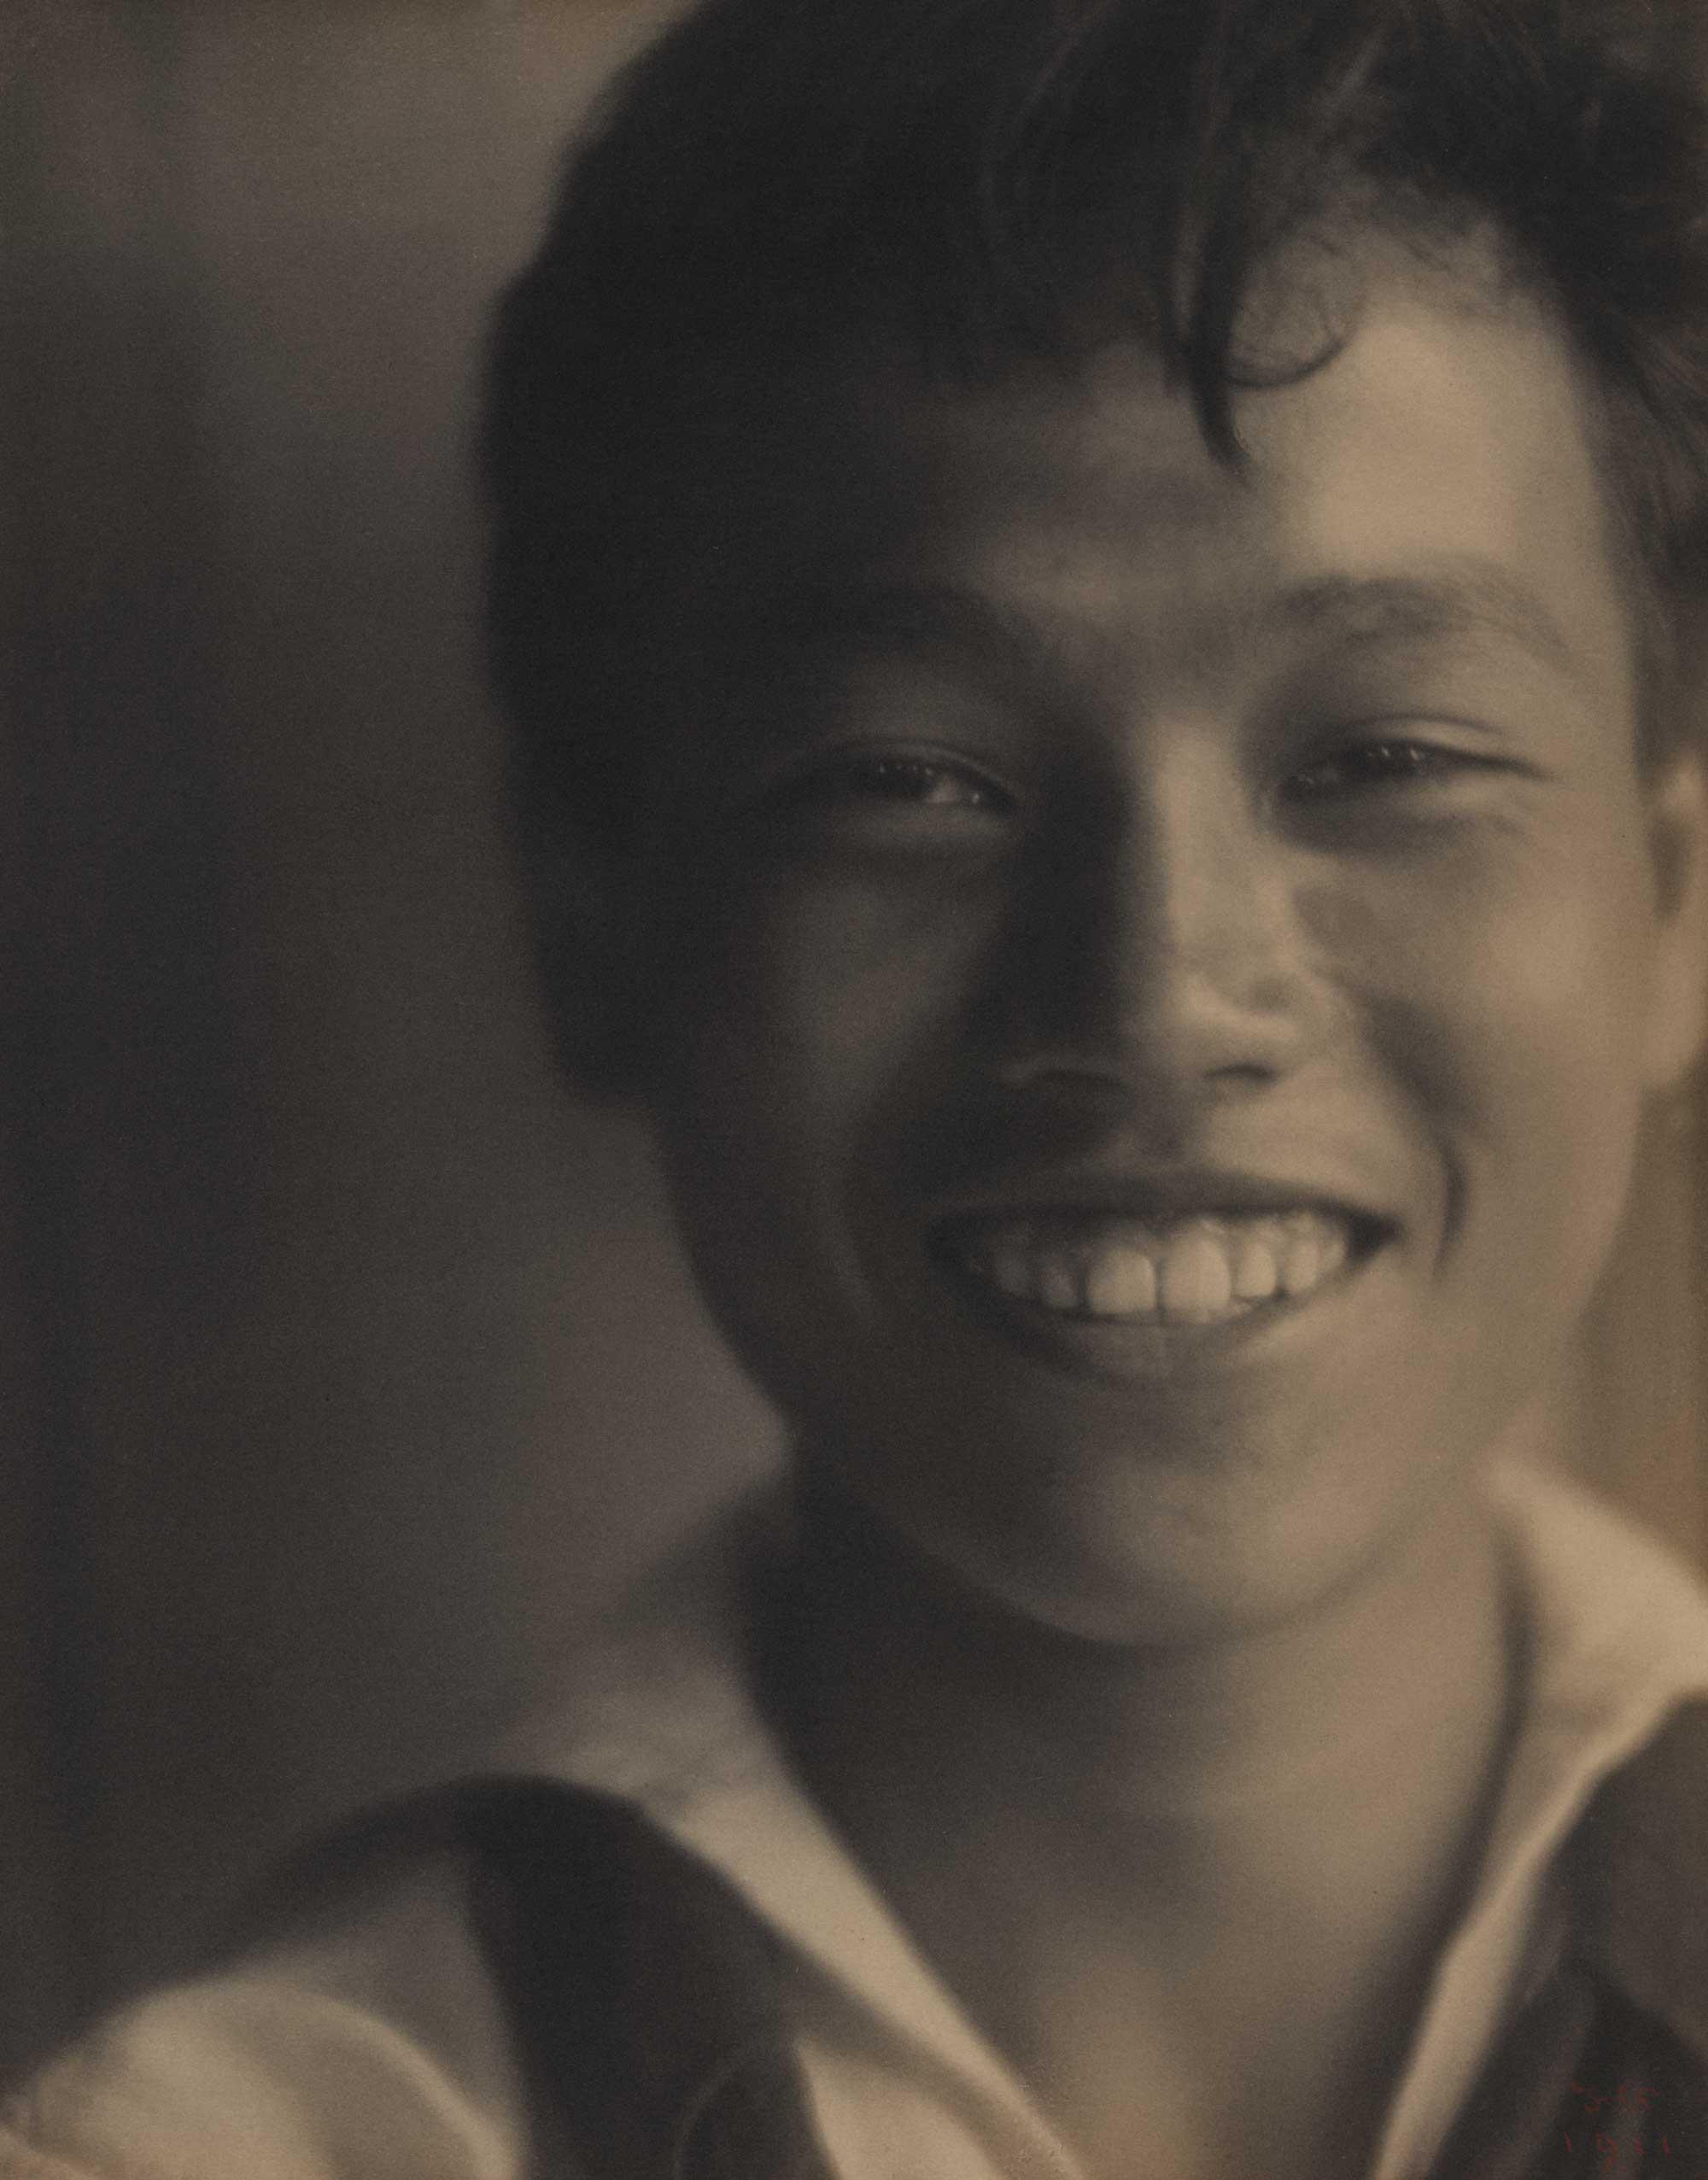 1911: David Leung, in sailor suit